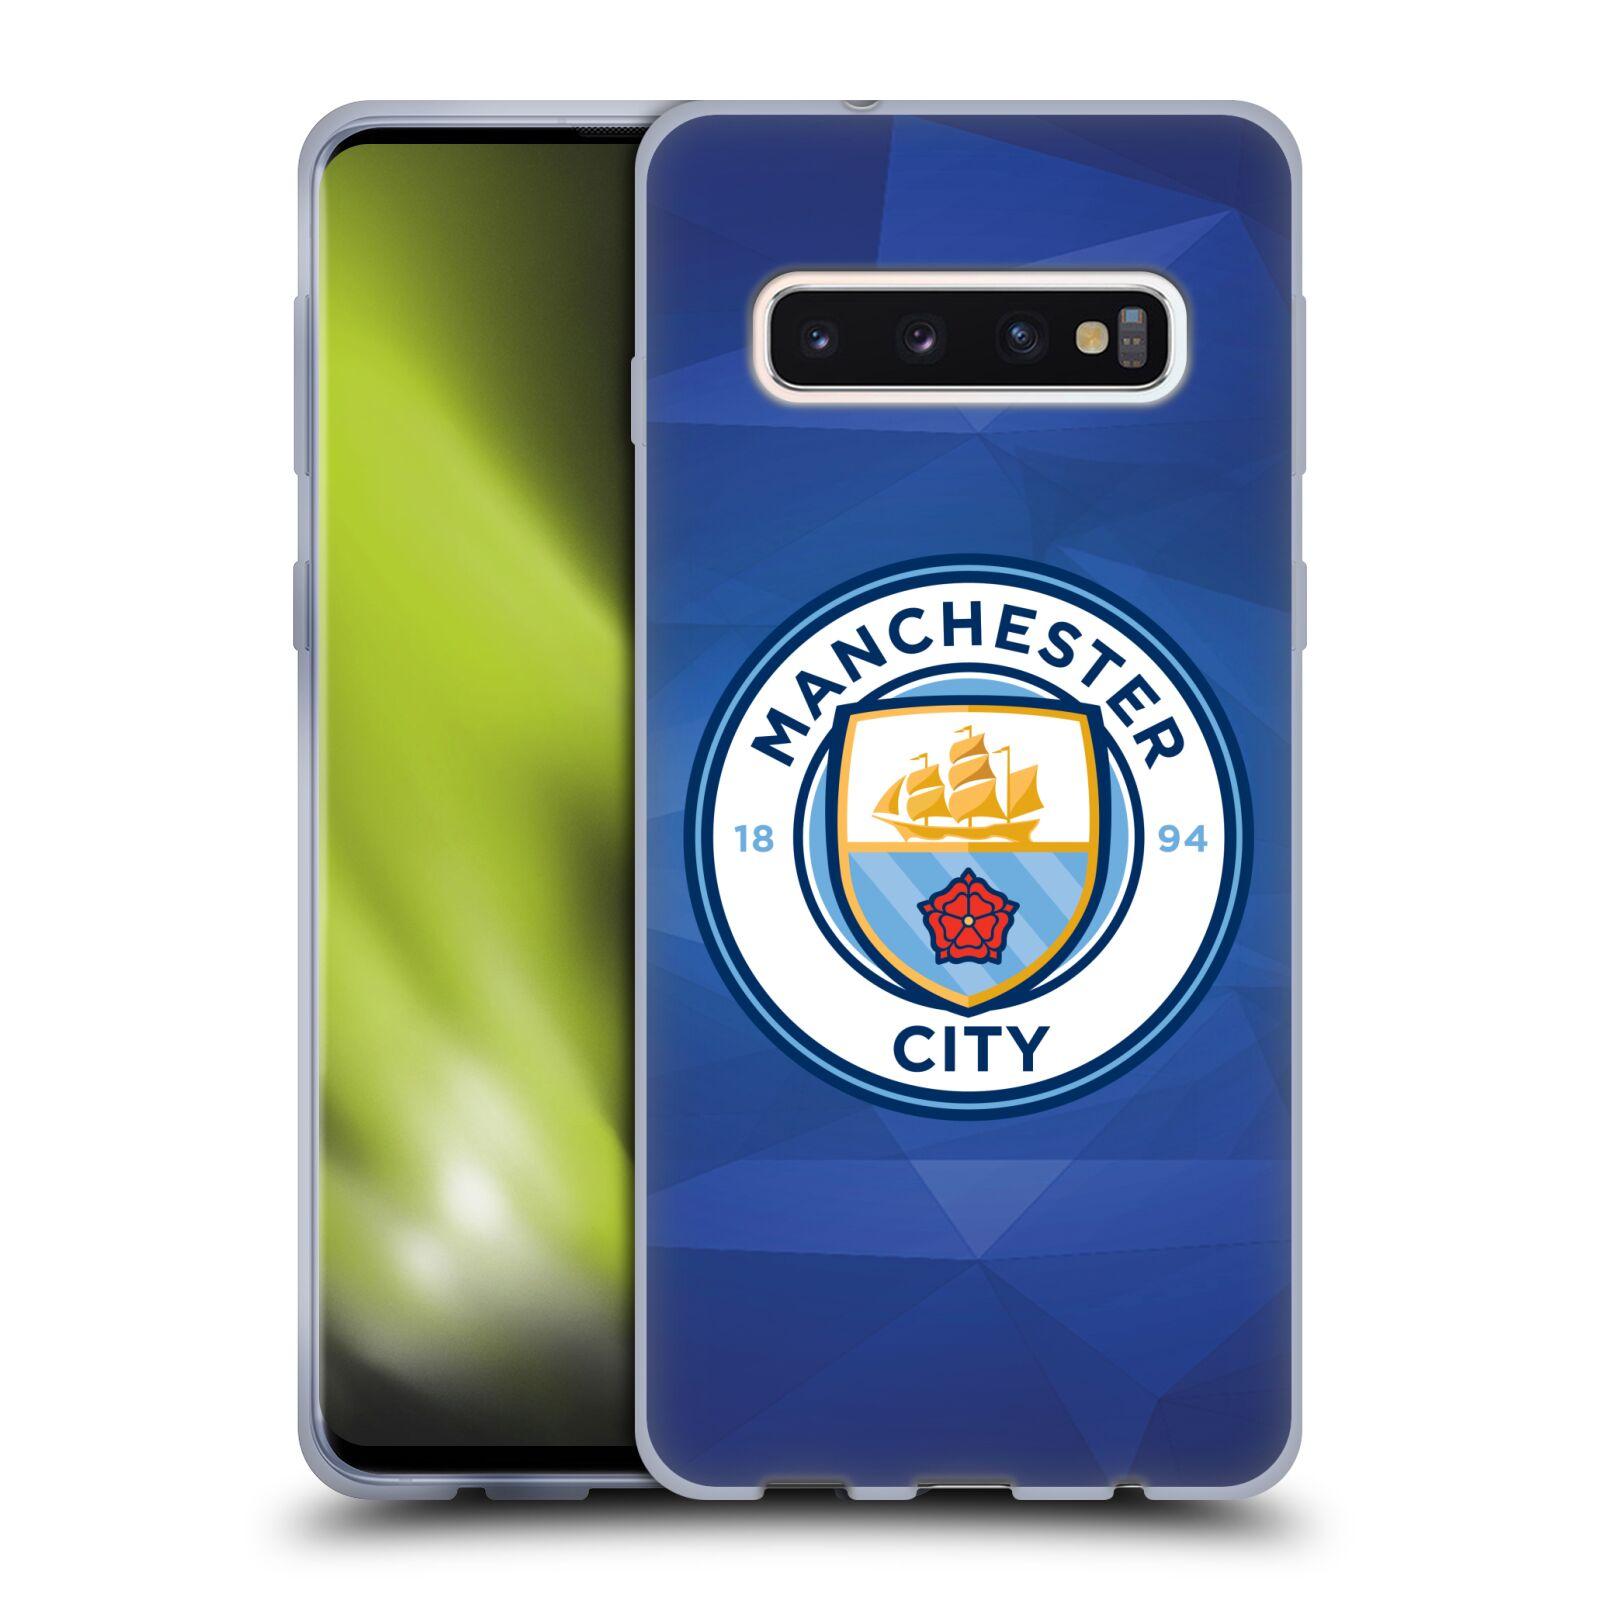 Silikonové pouzdro na mobil Samsung Galaxy S10 - Head Case - Manchester City FC - Modré nové logo